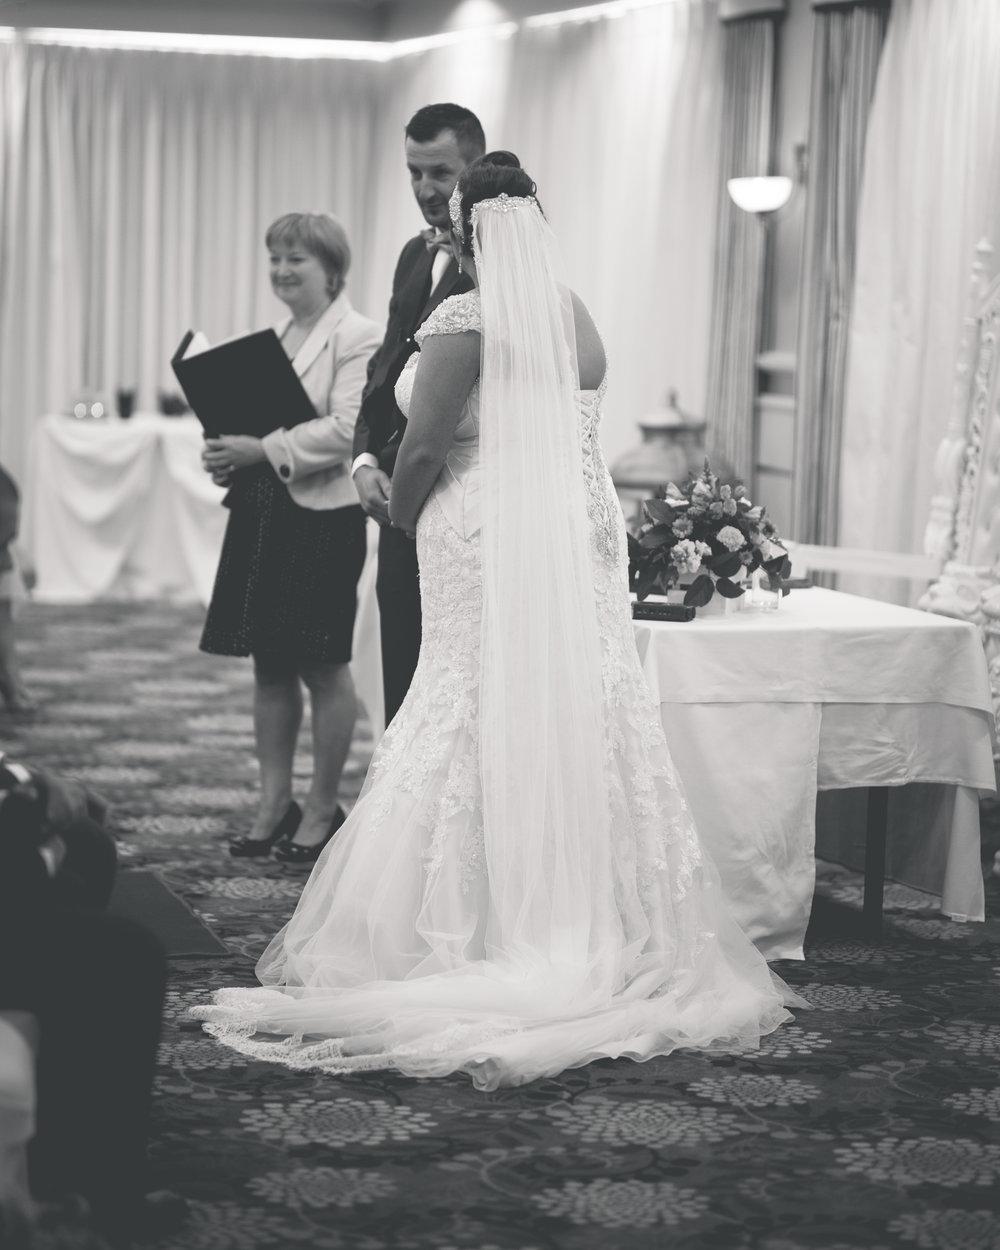 Antoinette & Stephen - Ceremony | Brian McEwan Photography | Wedding Photographer Northern Ireland 64.jpg